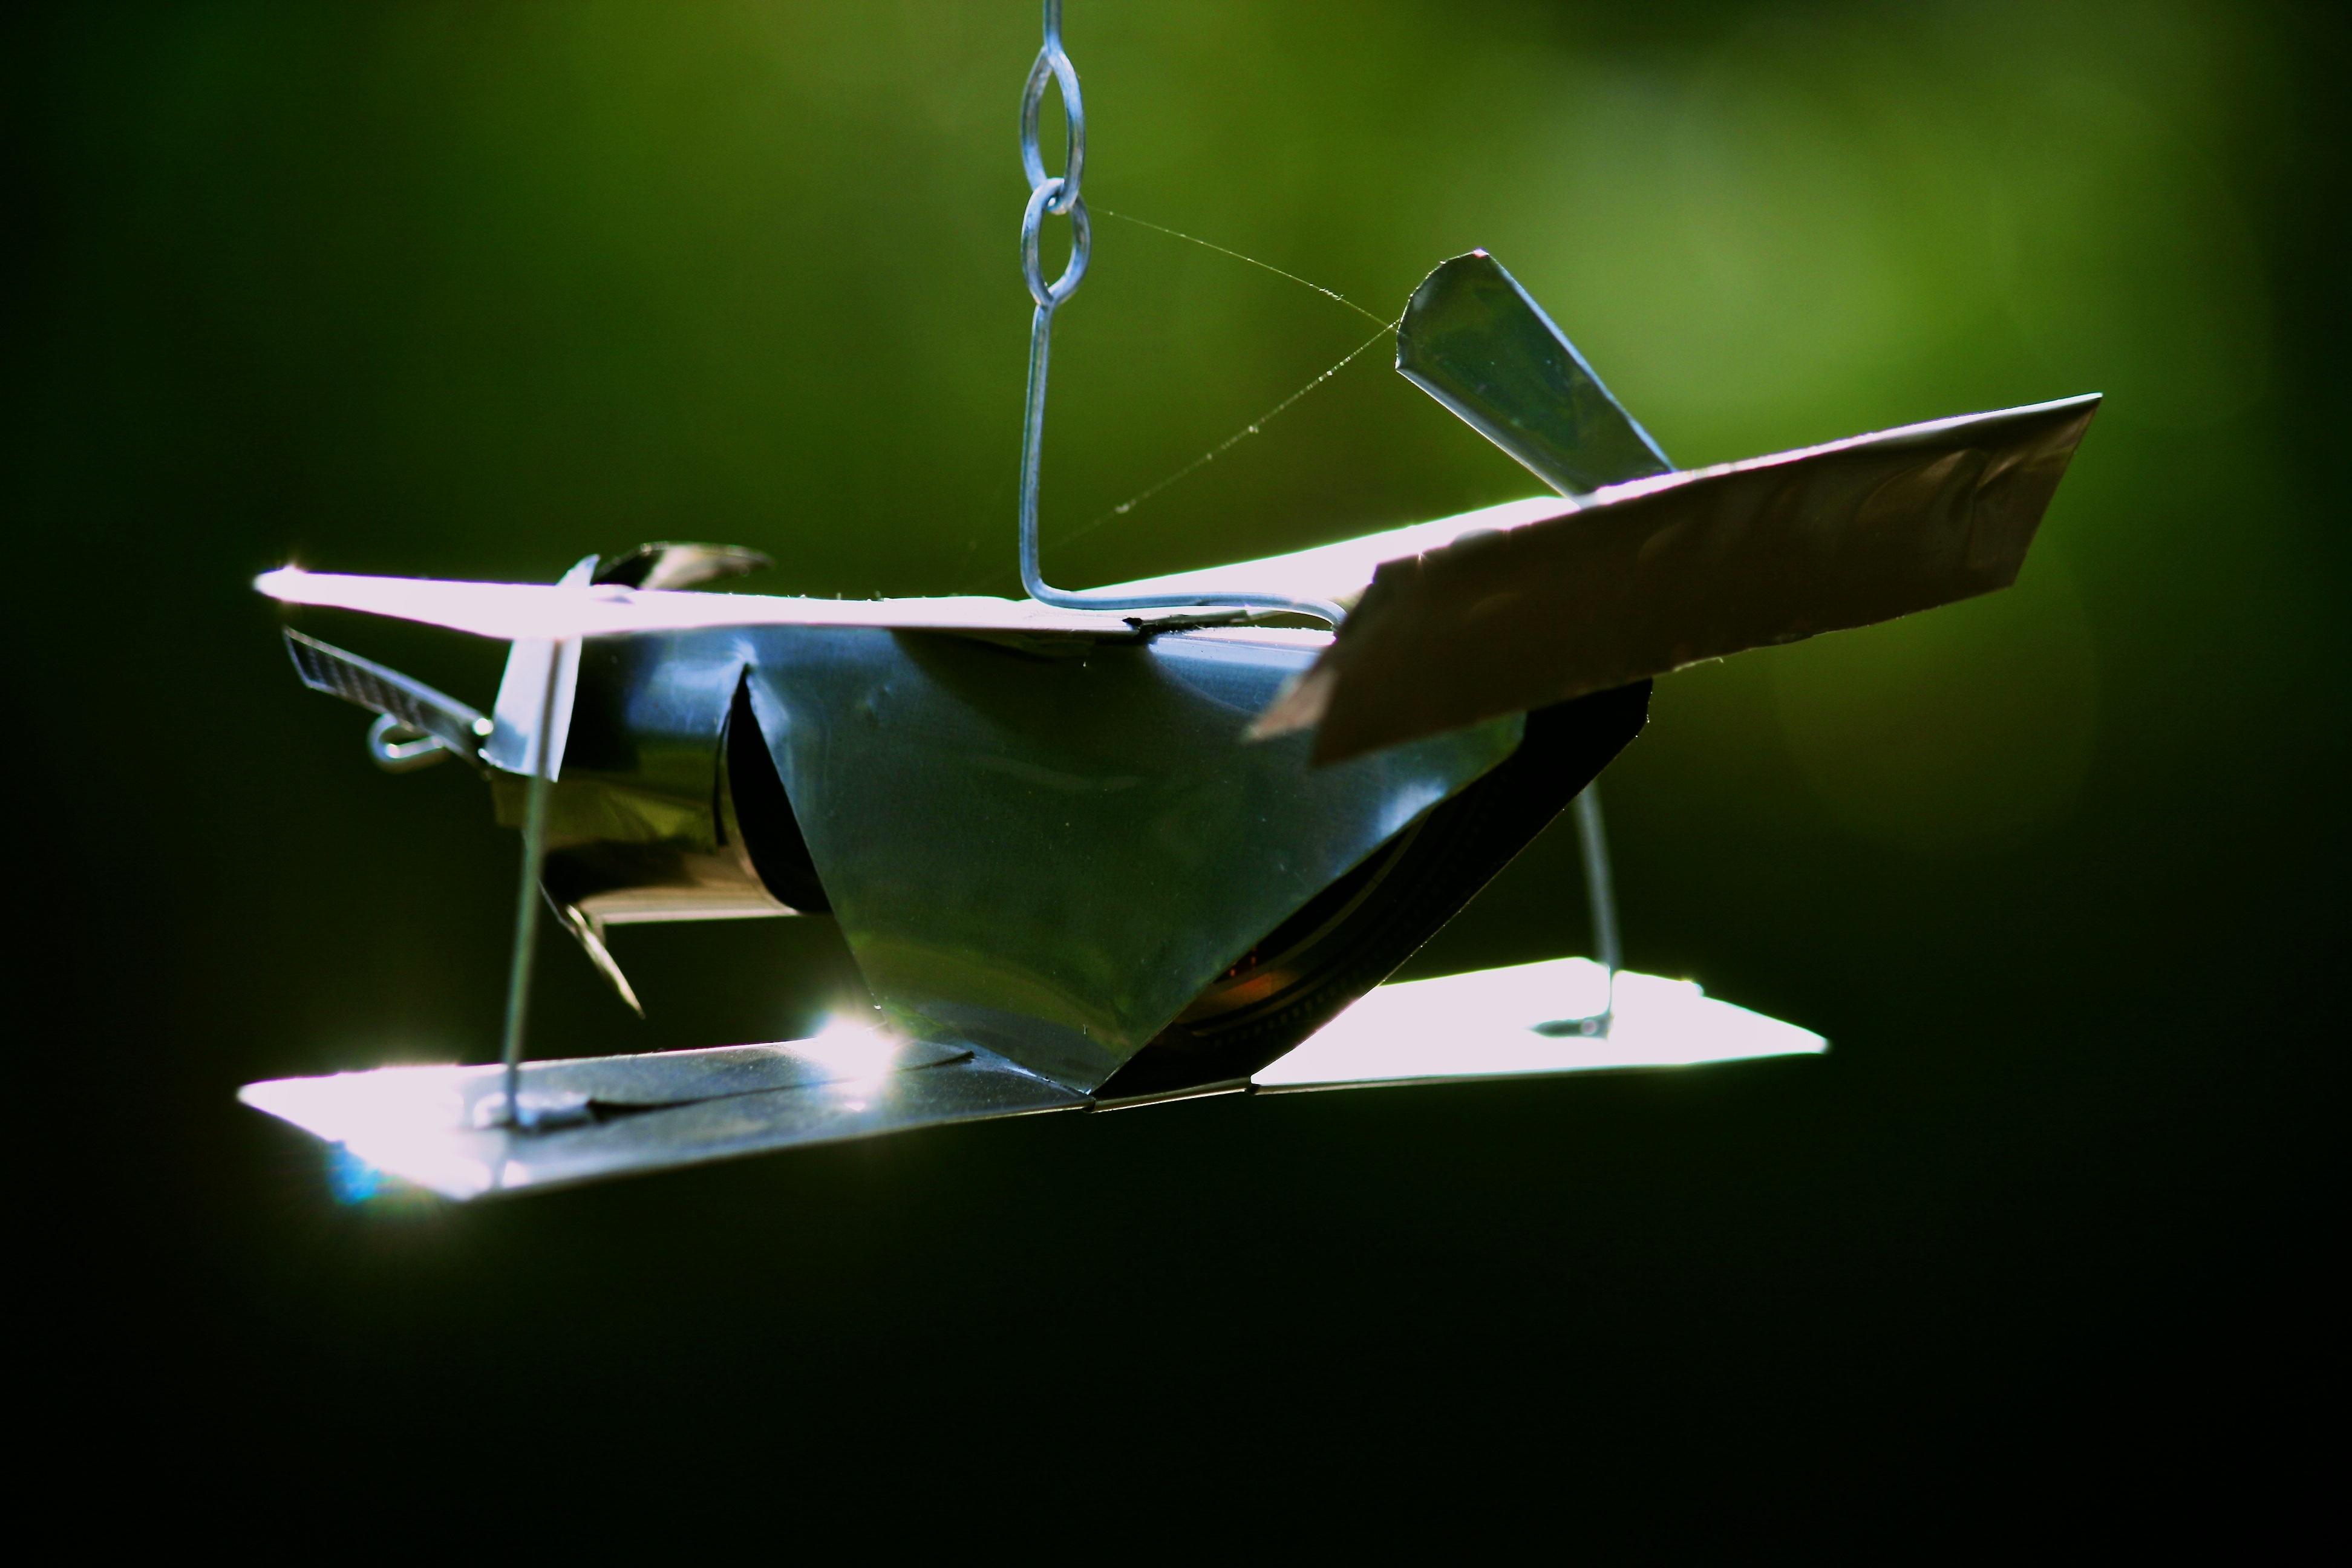 Fotos Gratis Mesa Ala Silla Avi N Aeronave Verde Veh Culo  # Muebles Hojalata